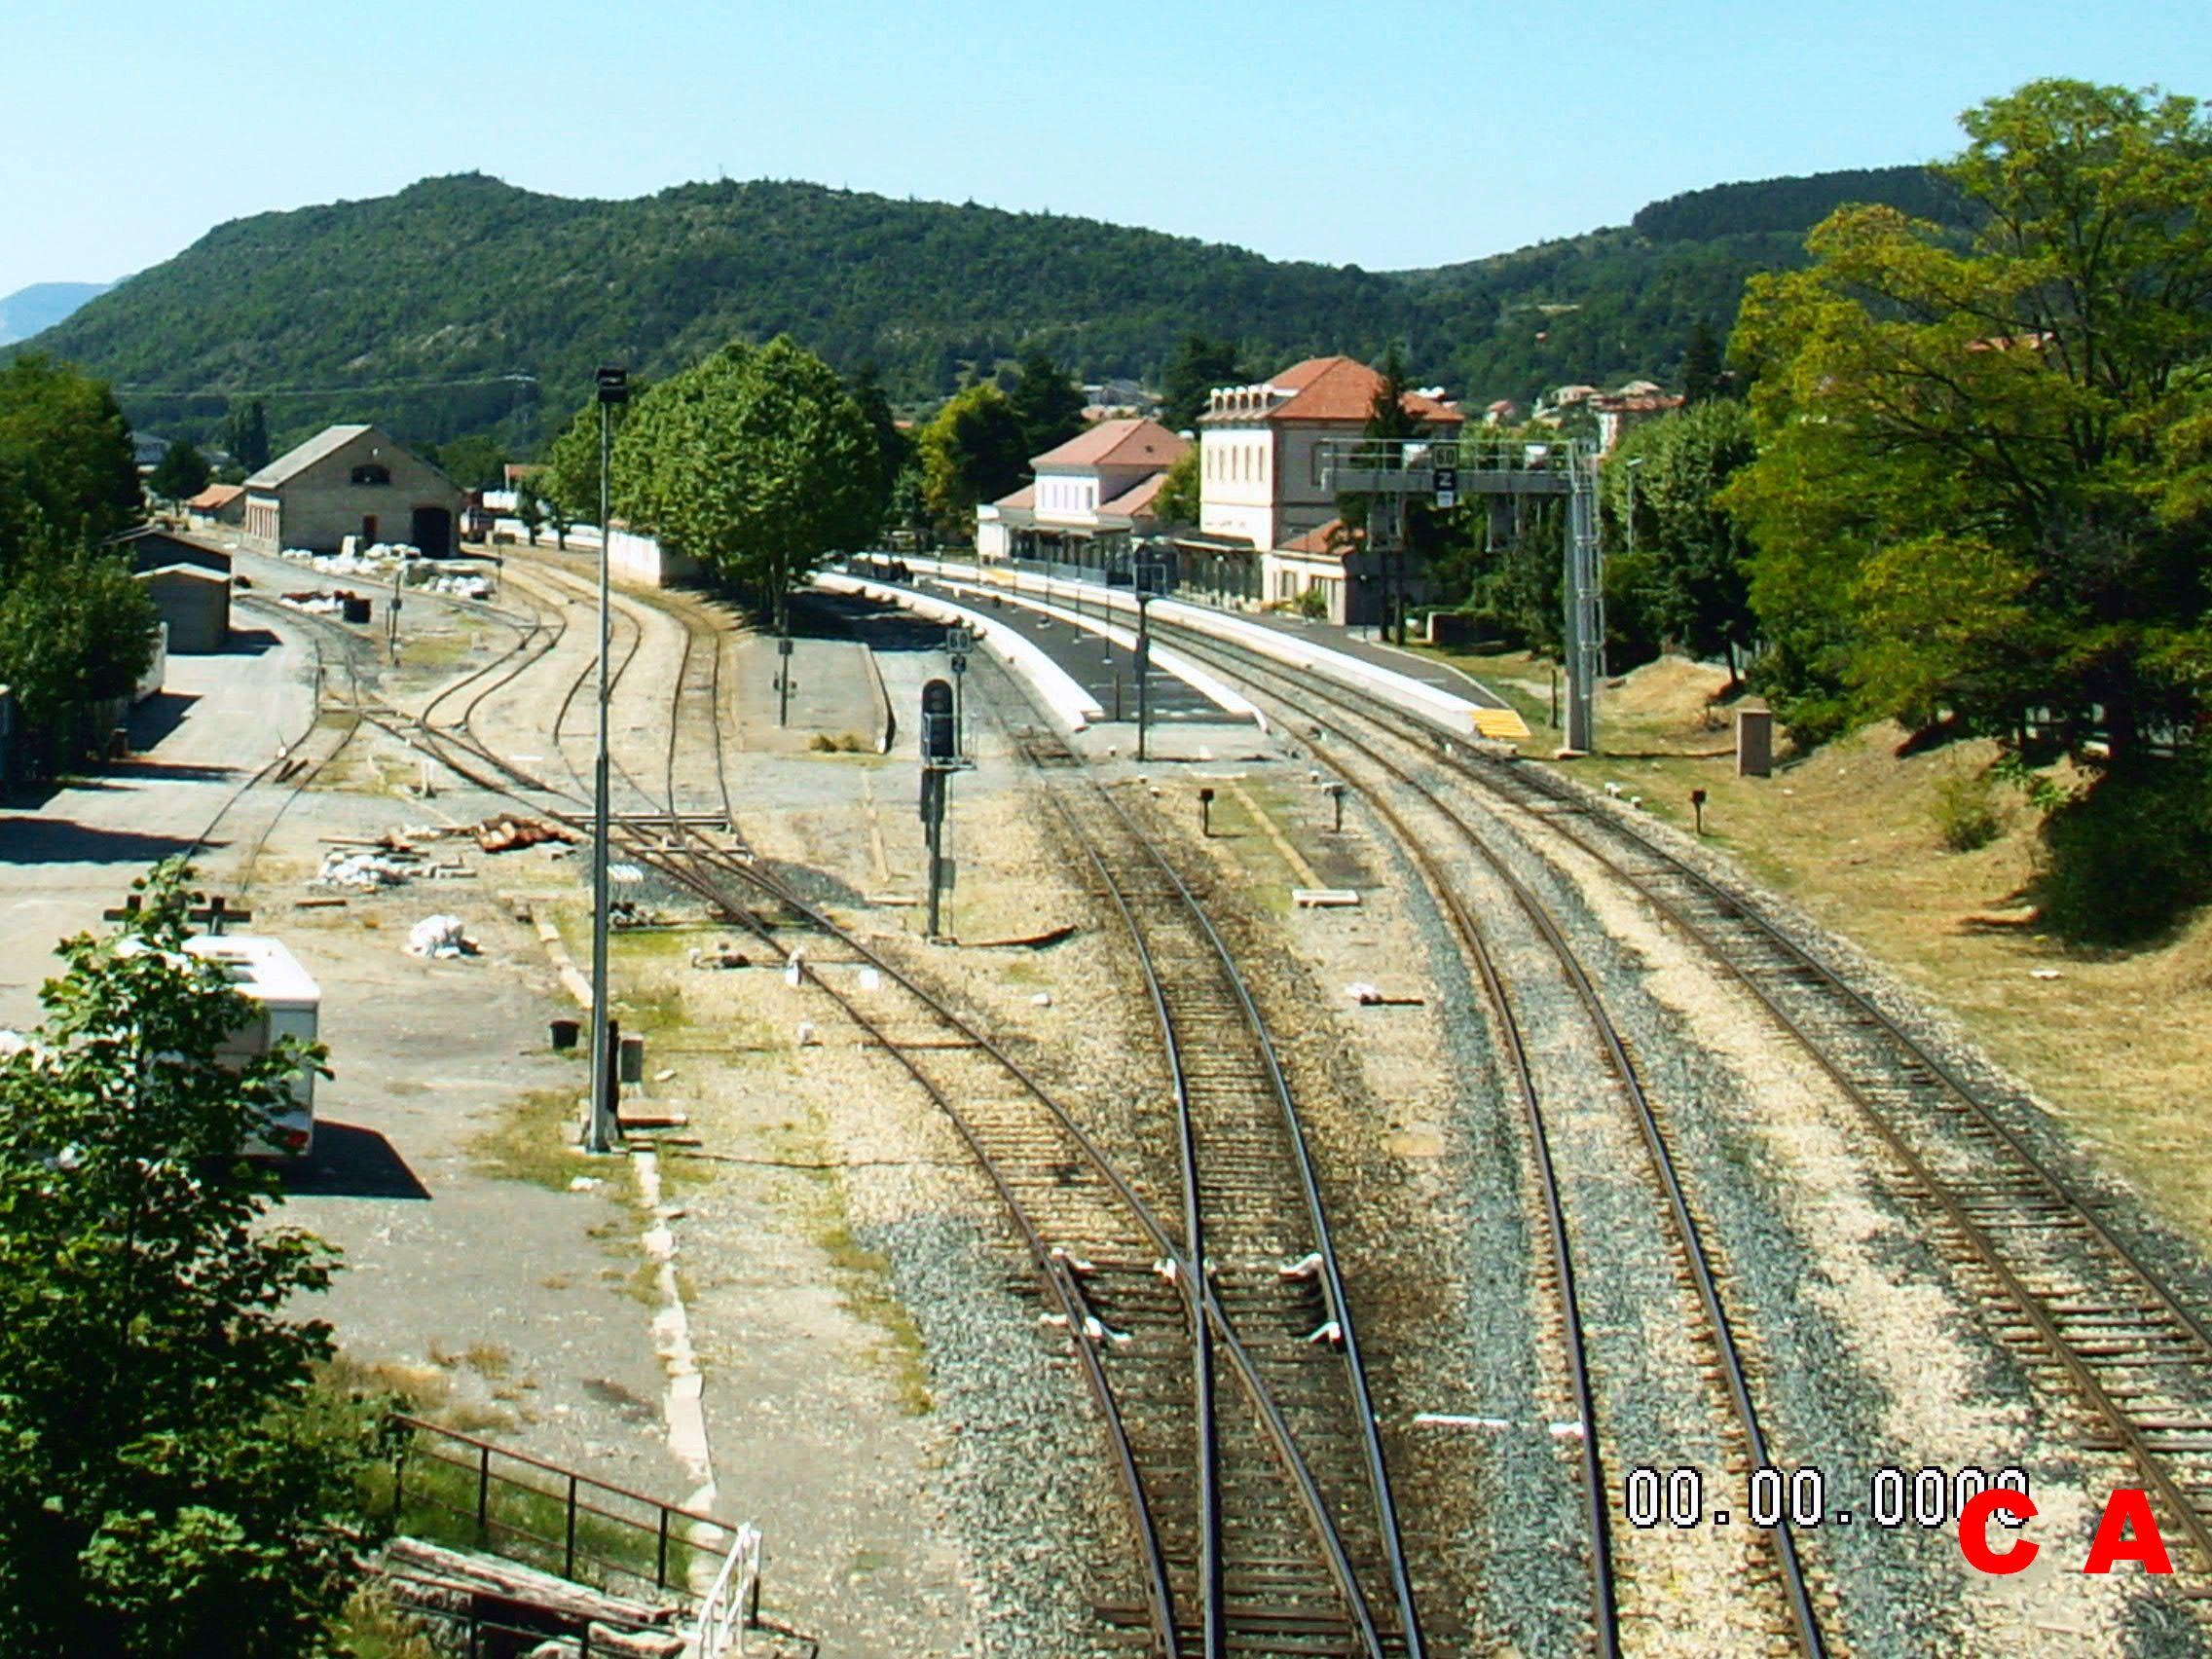 Gare de Veyne